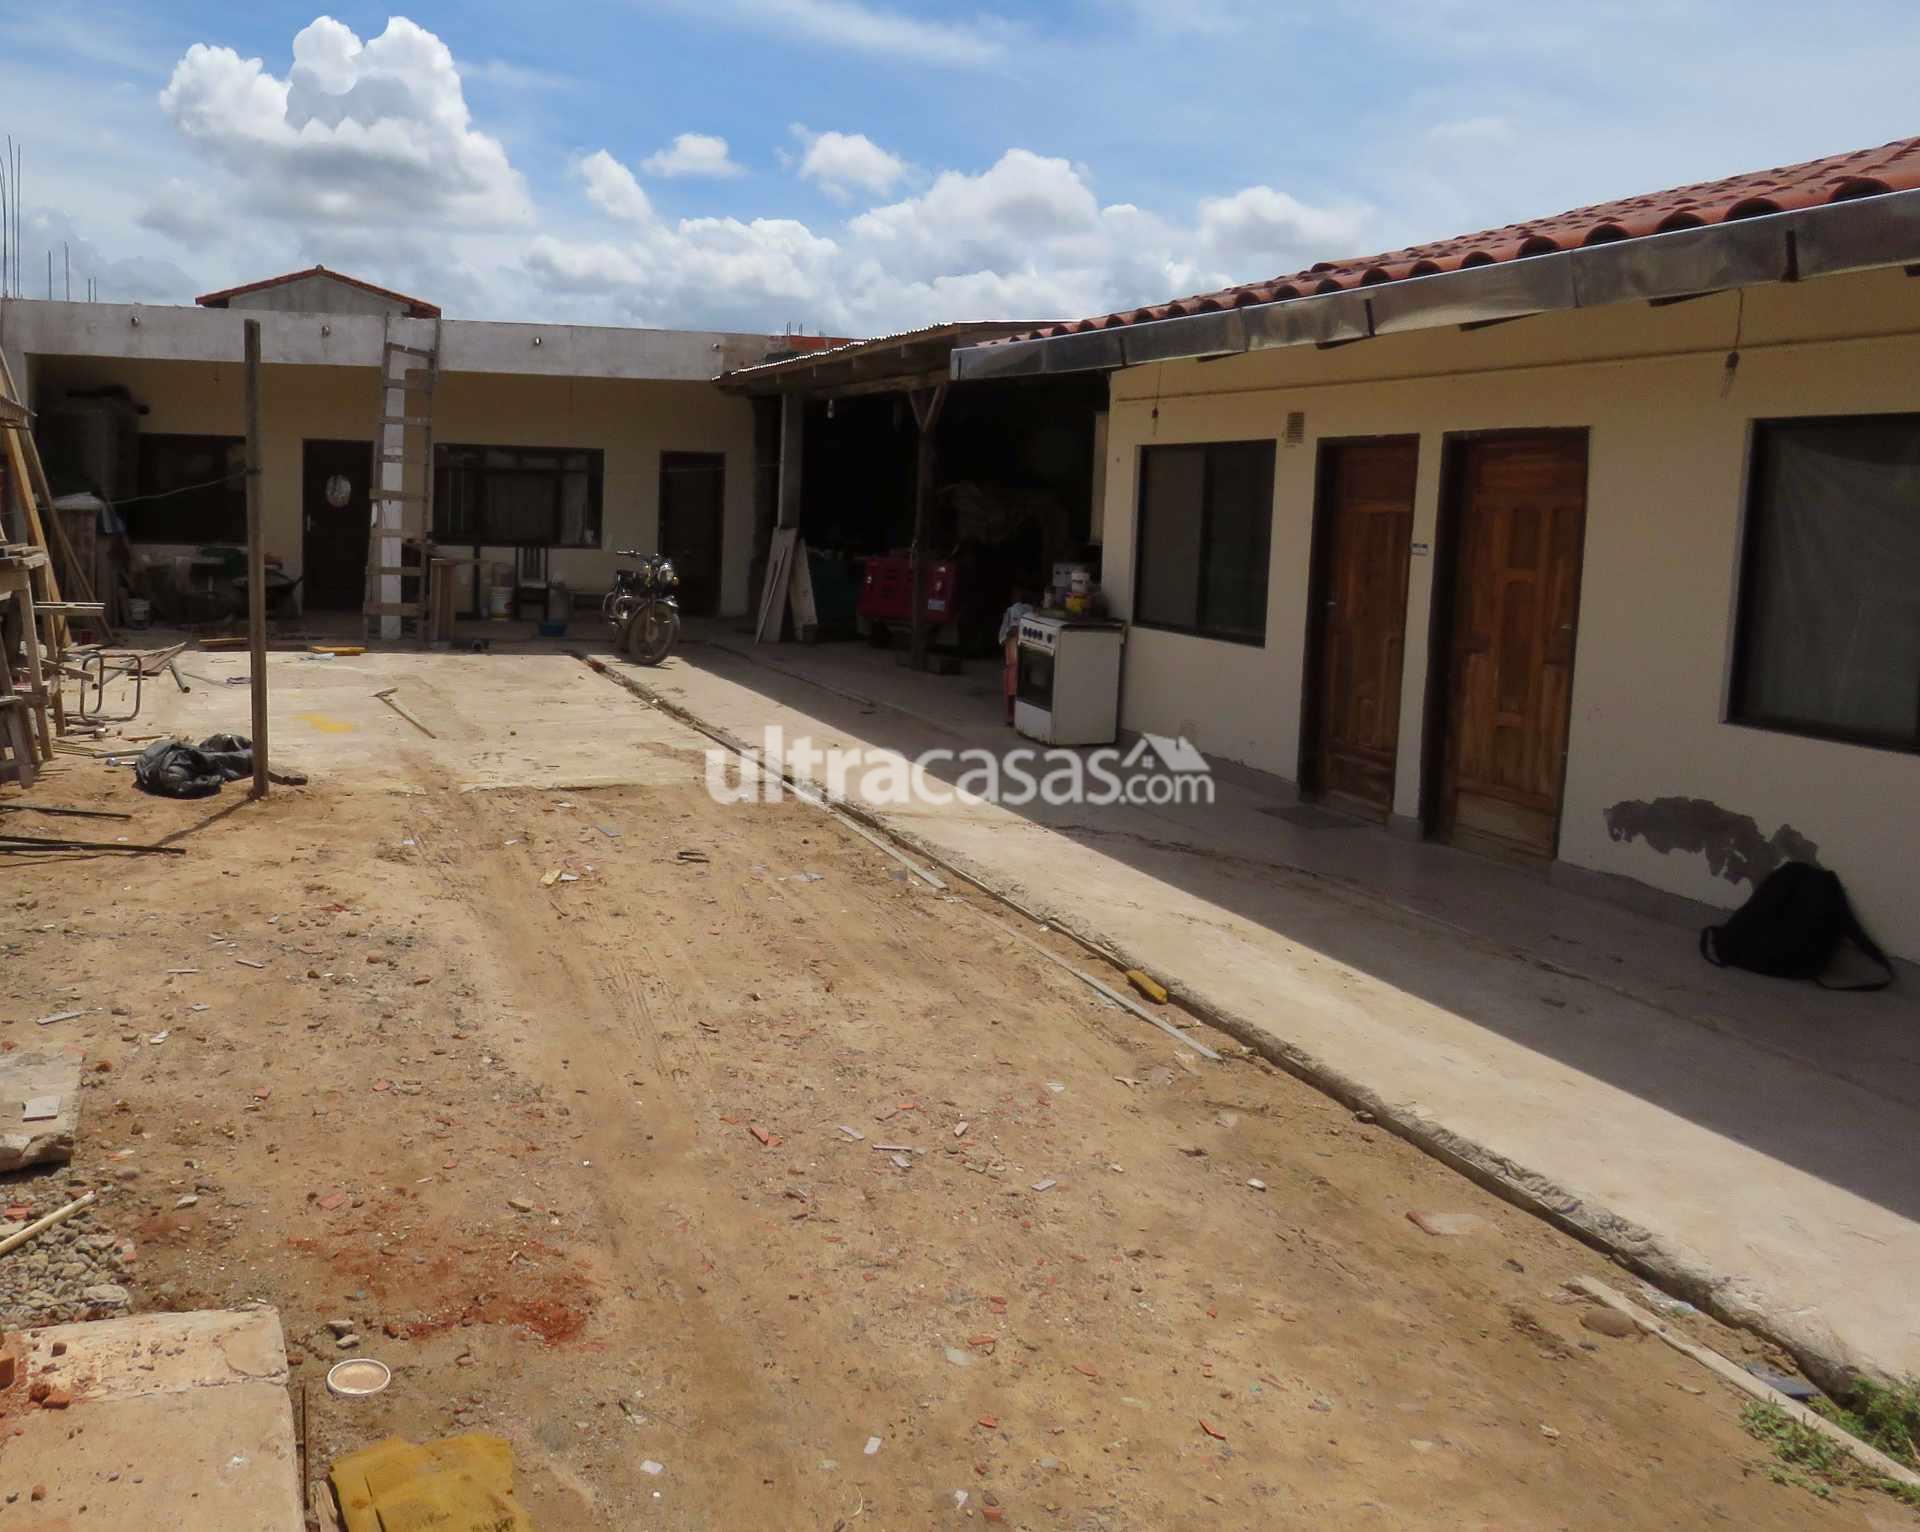 Casa en Venta AV BOLIVA CALLE 12 (BARRIO 24 DE JULIO)  Foto 2